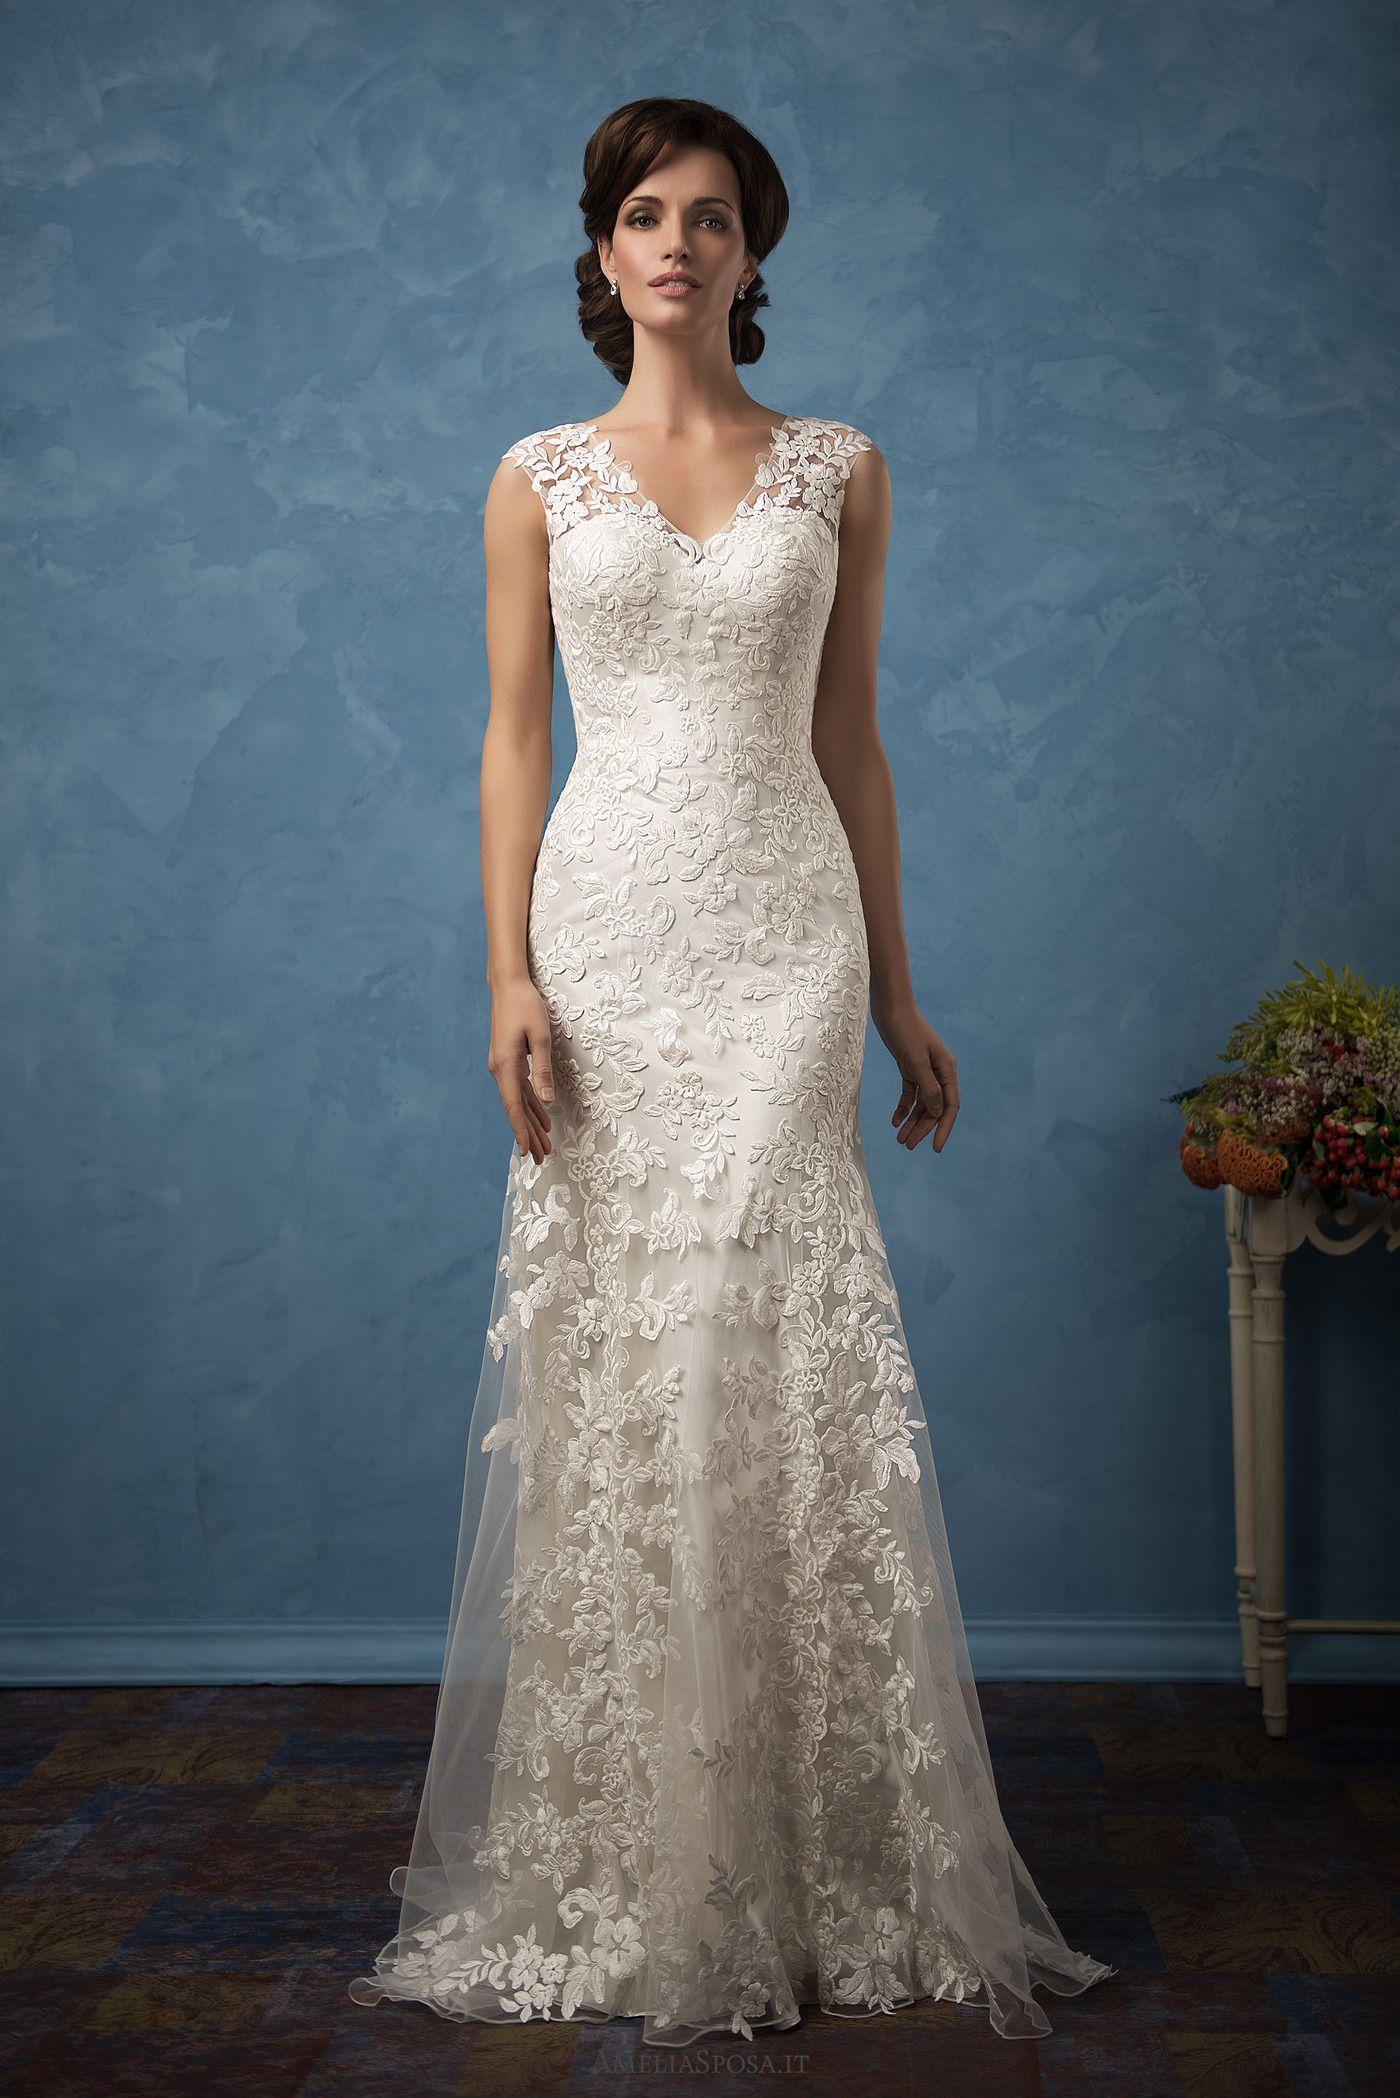 Best Gatsby Wedding Gown Images - Wedding Ideas - memiocall.com